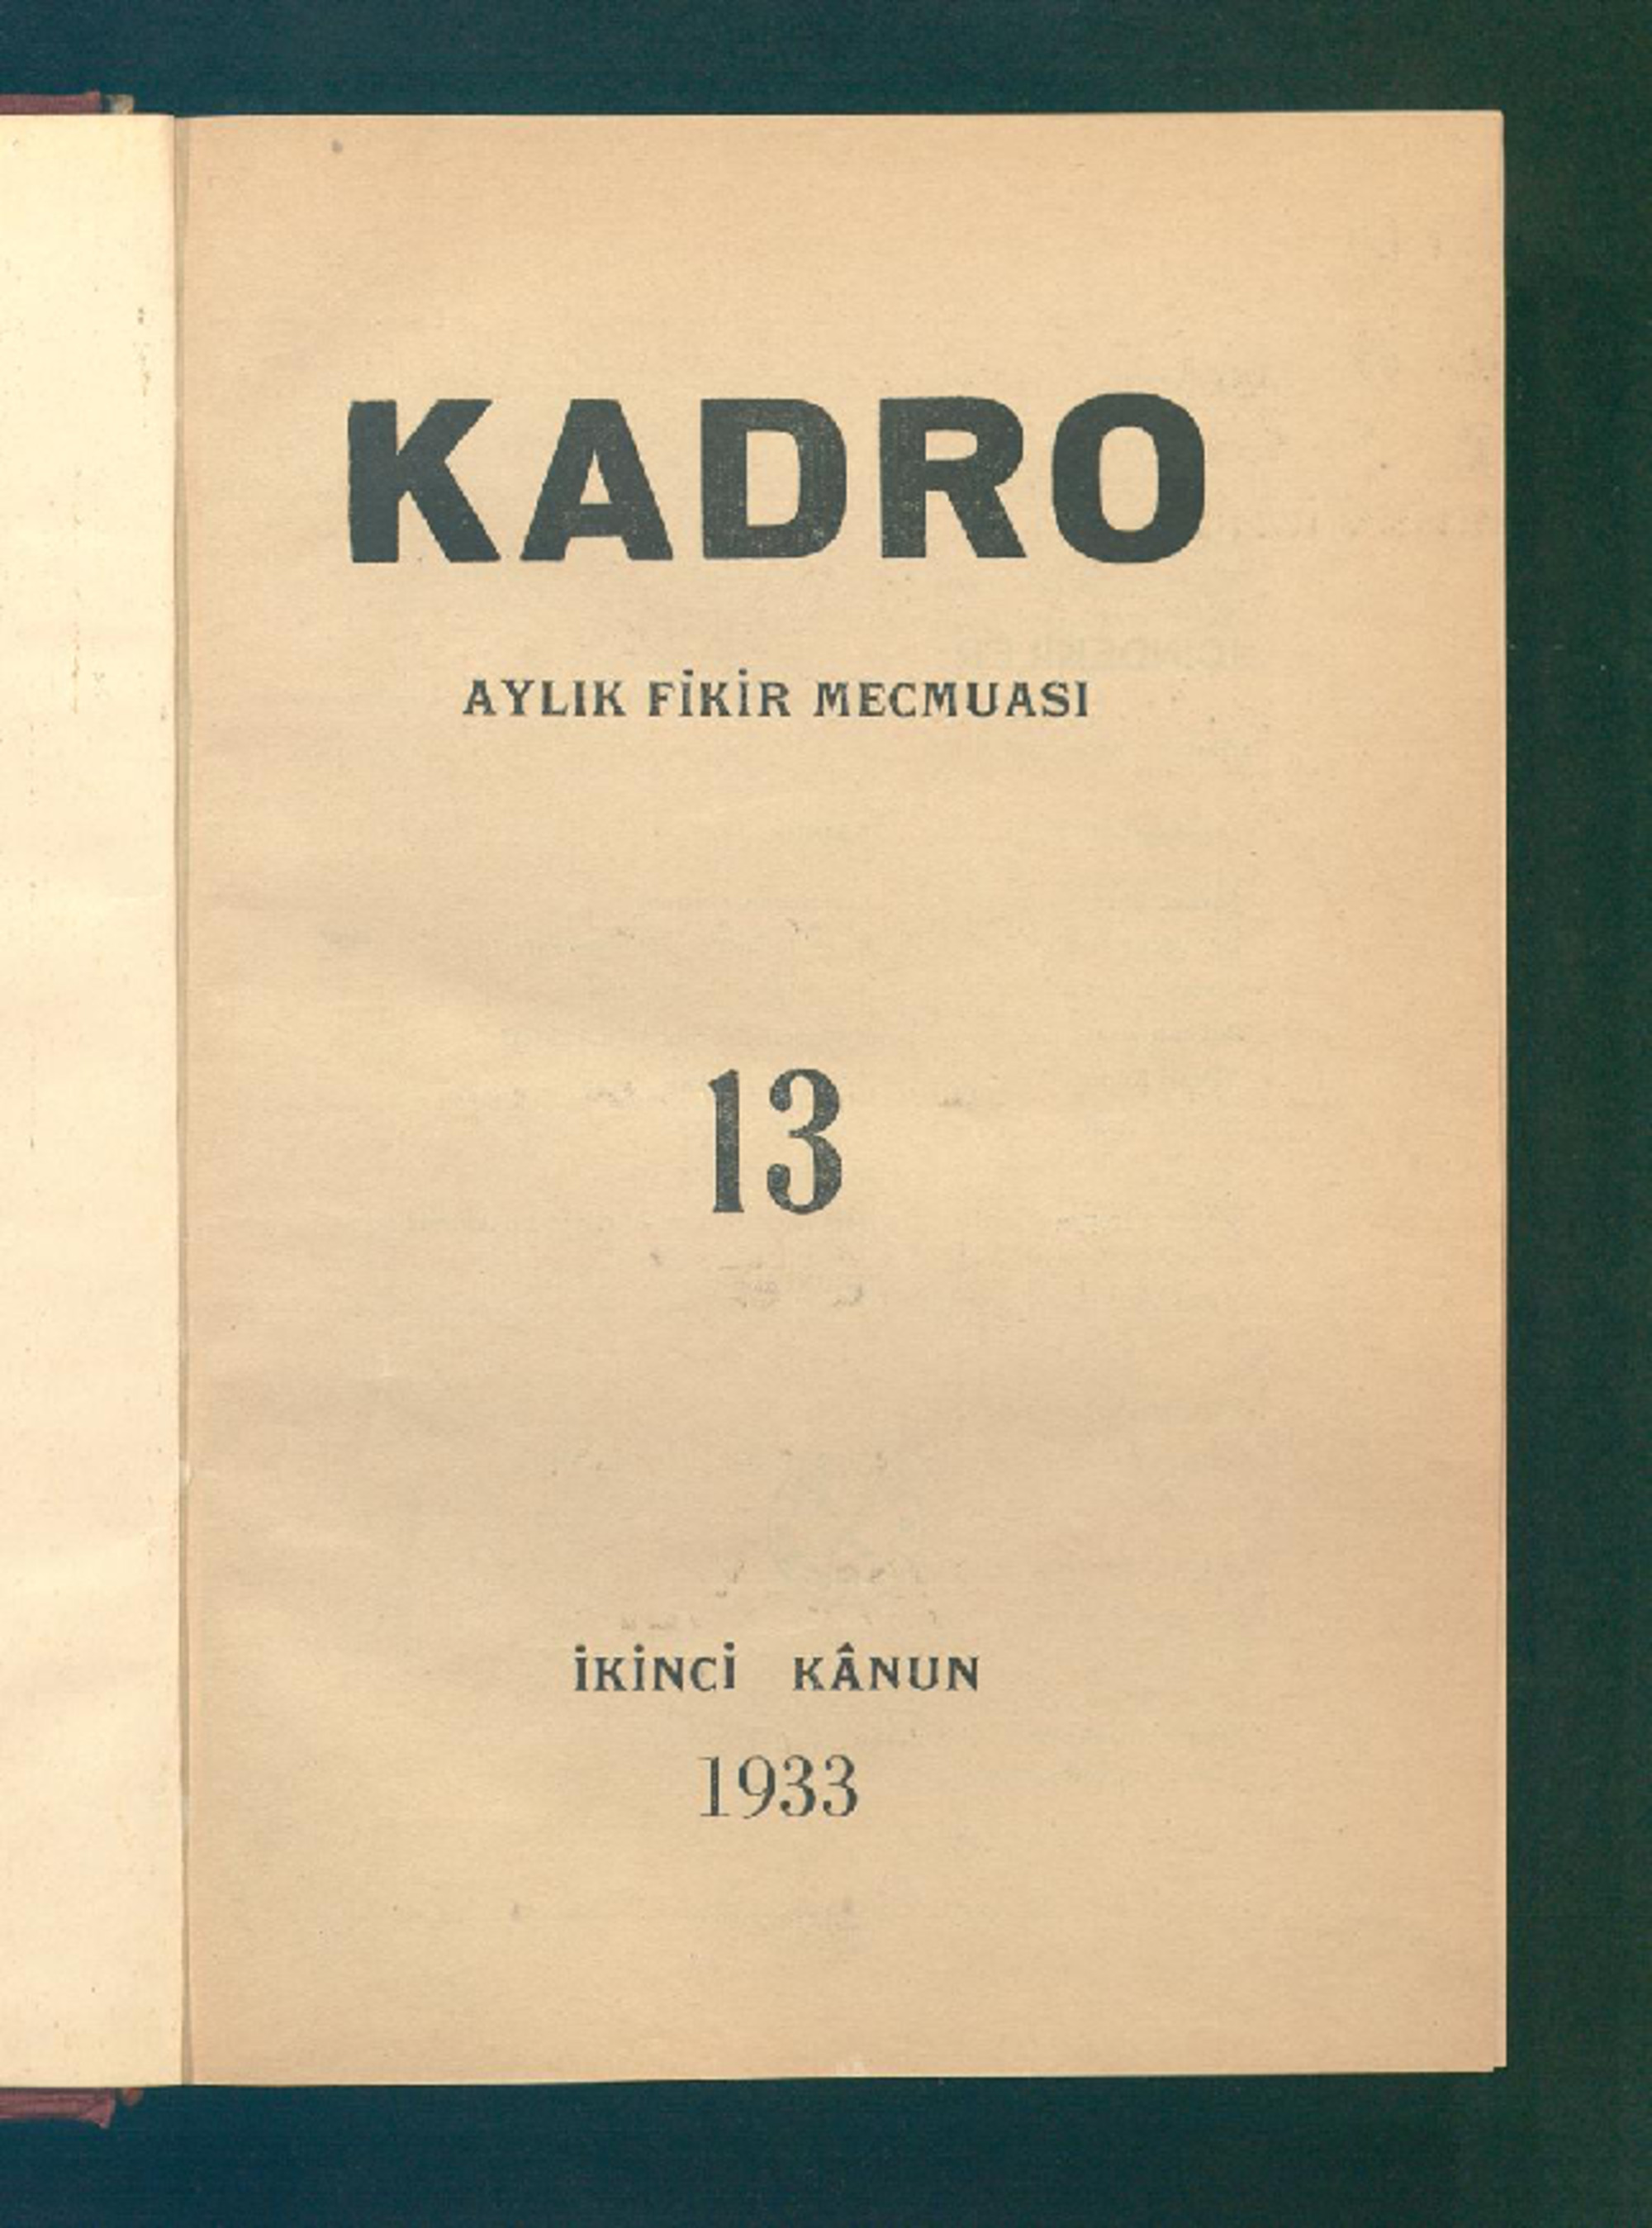 1 Ocak 1933 Tarihli Kadro Dergisi Sayfa 1